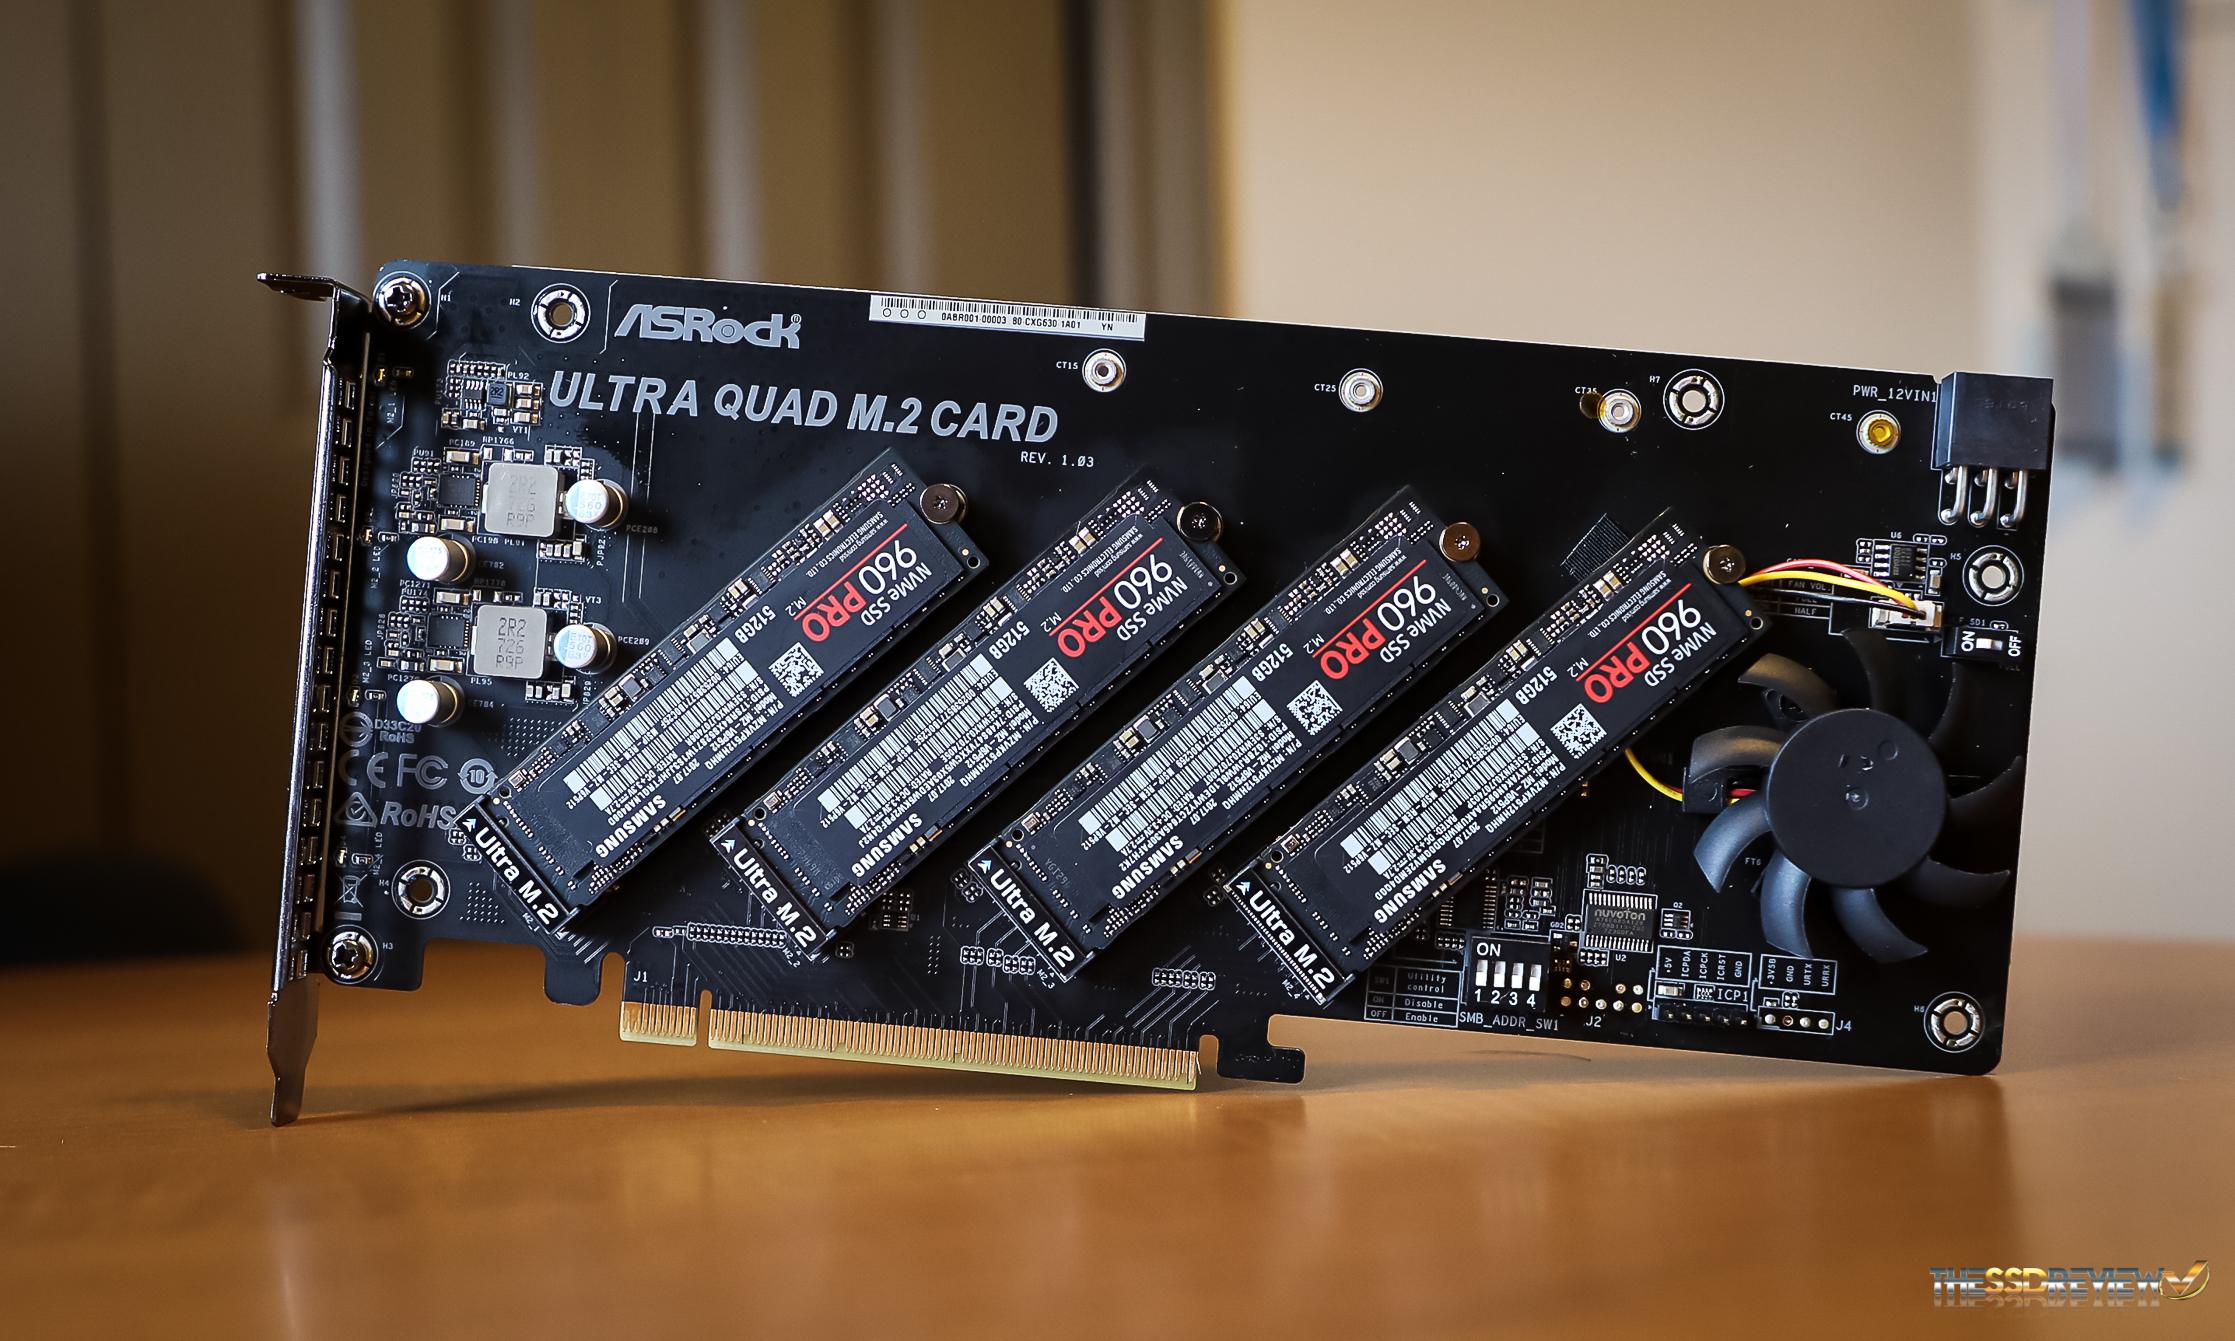 ASRock Ultra Quad M 2 Card Review – 4 x M 2 SSD RAID at 10GB/s and